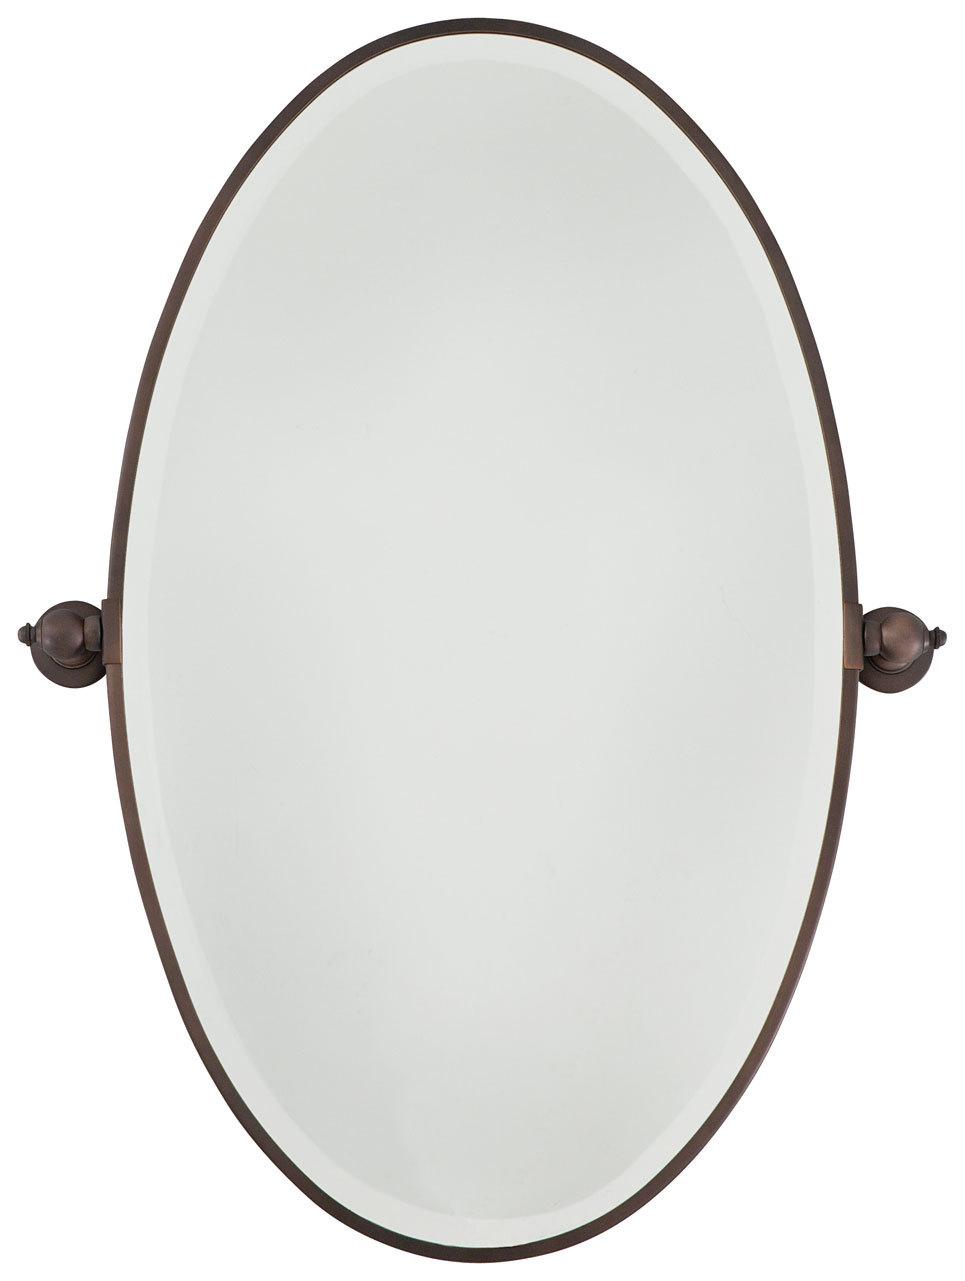 Oval Extra Large Bath Mirror Jan/10 : 1432-267  LBU Lighting